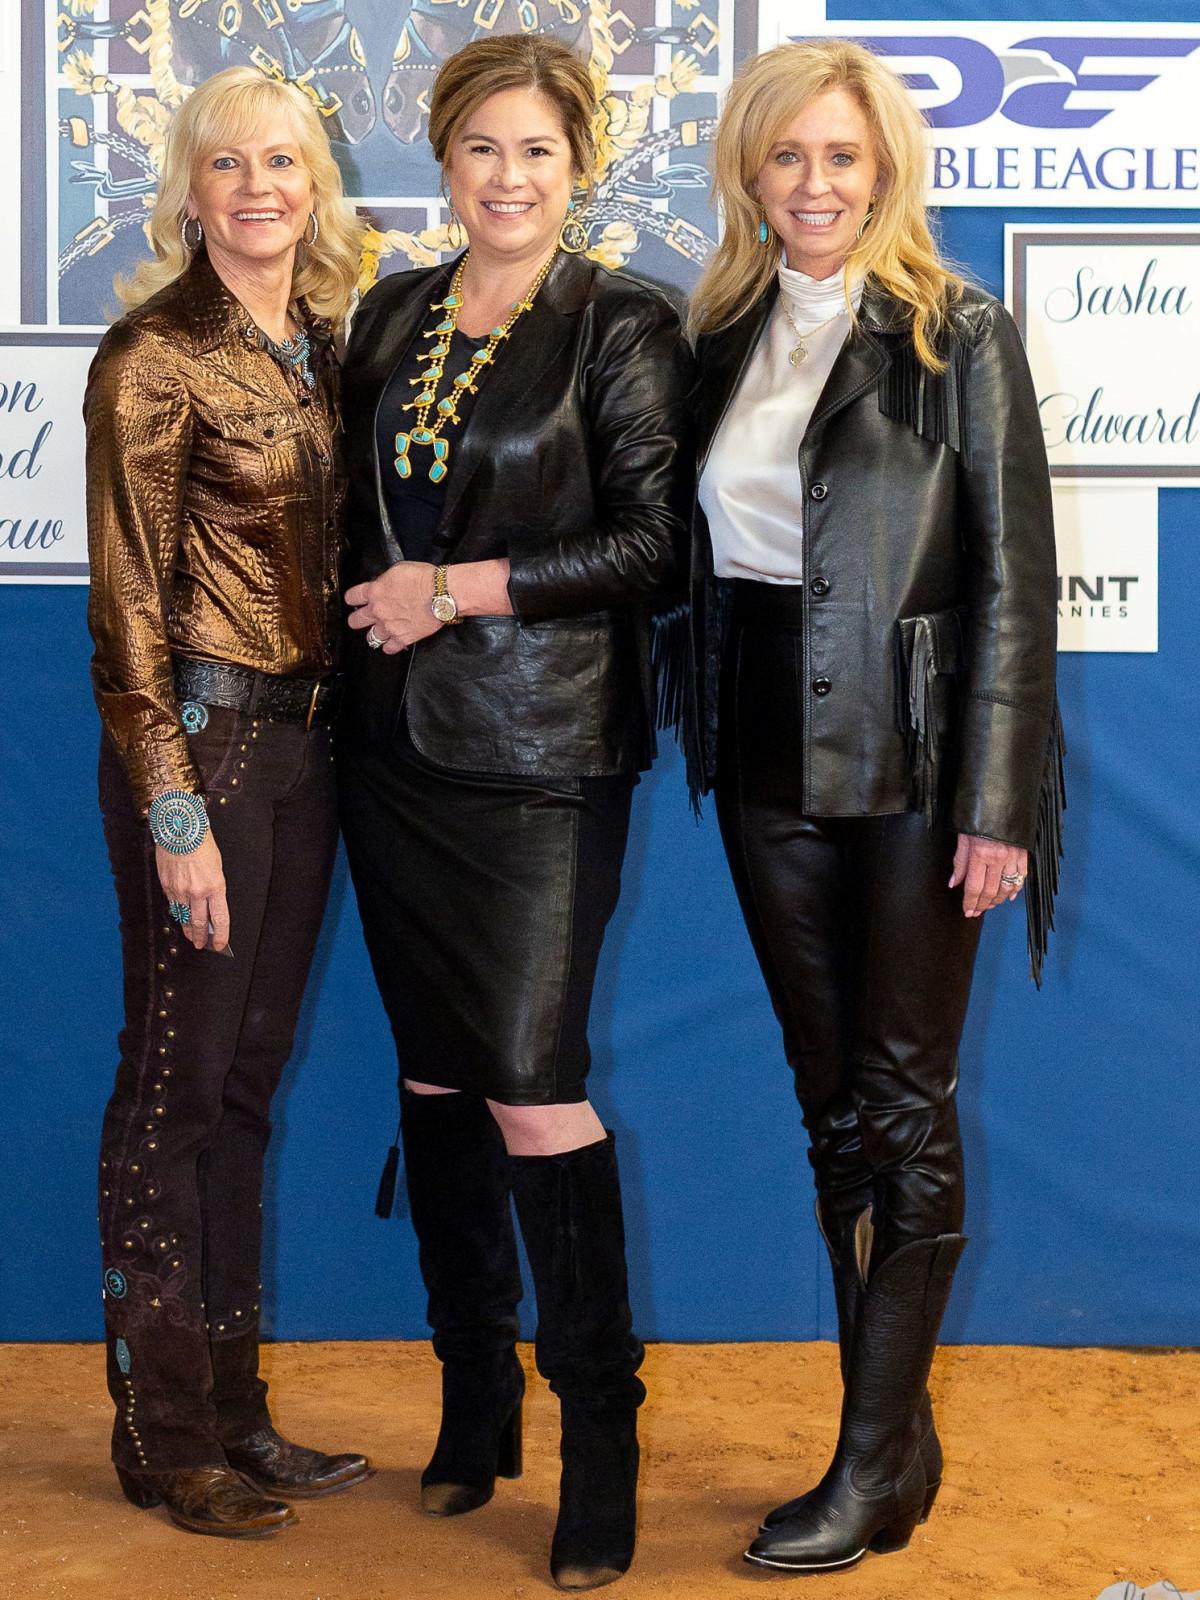 Amy Bailey, Kelsey Patterson, Paige Randel